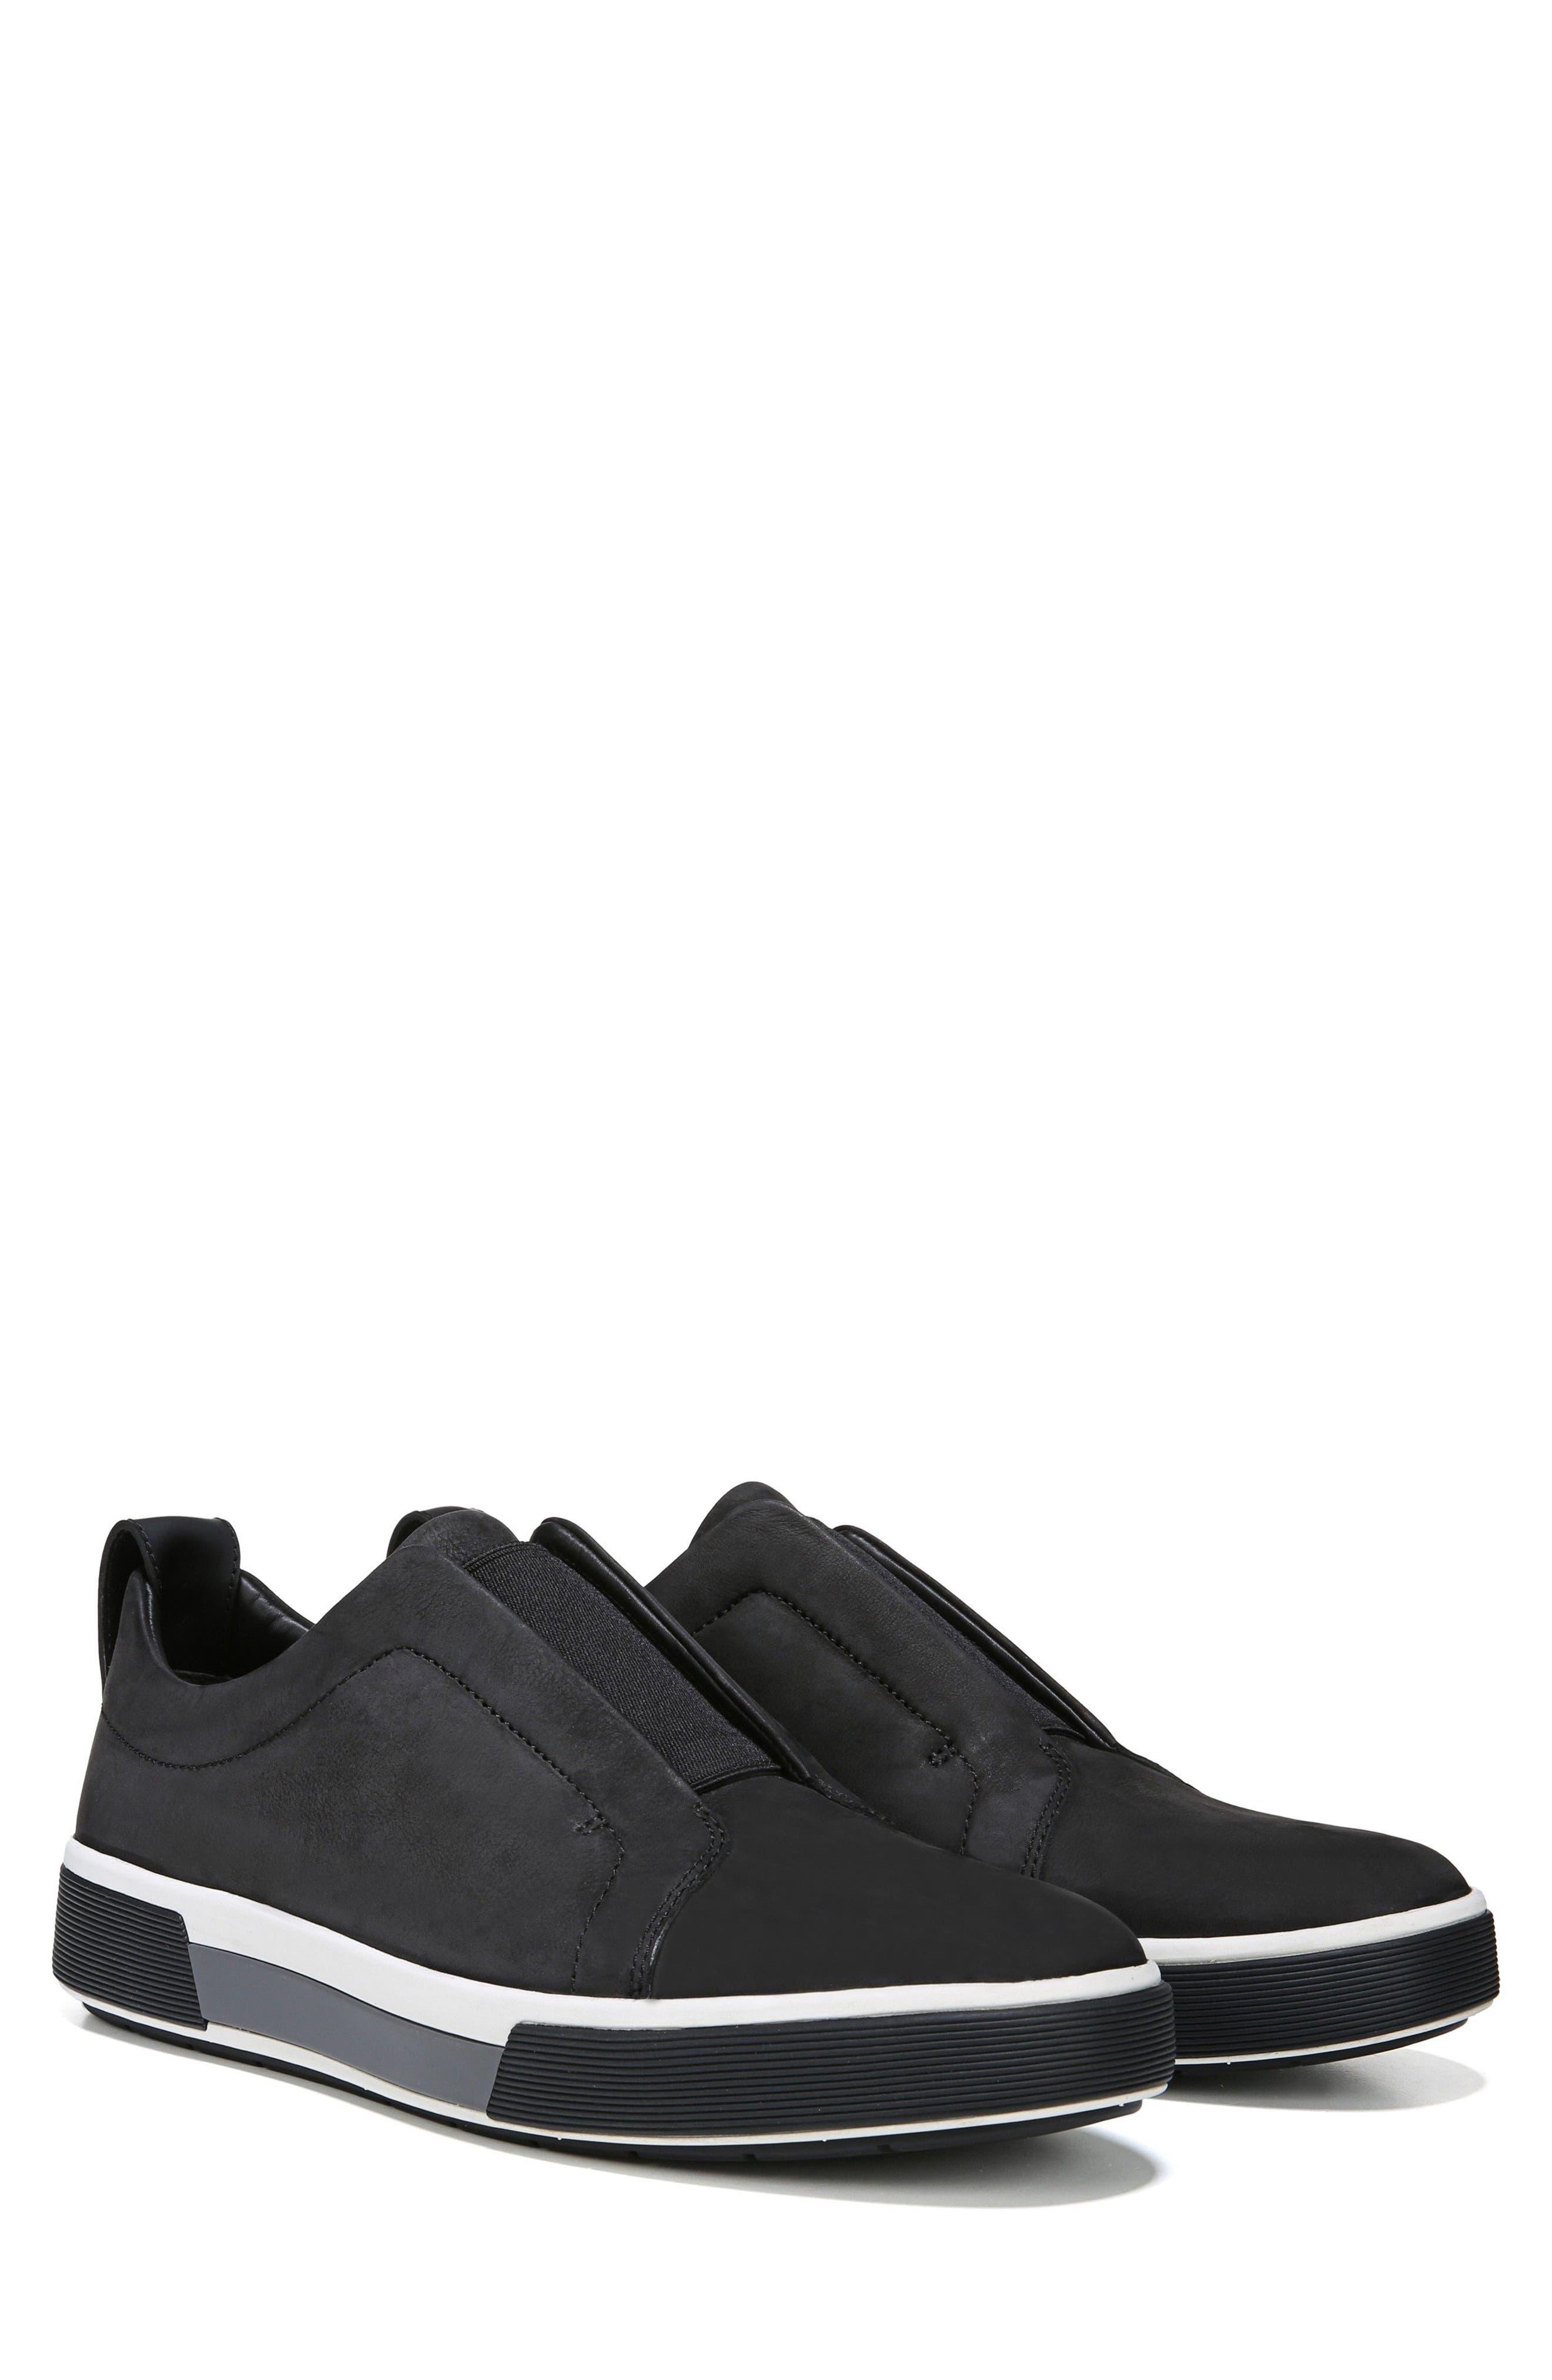 VINCE, Ranger Laceless Sneaker, Alternate thumbnail 8, color, BLACK